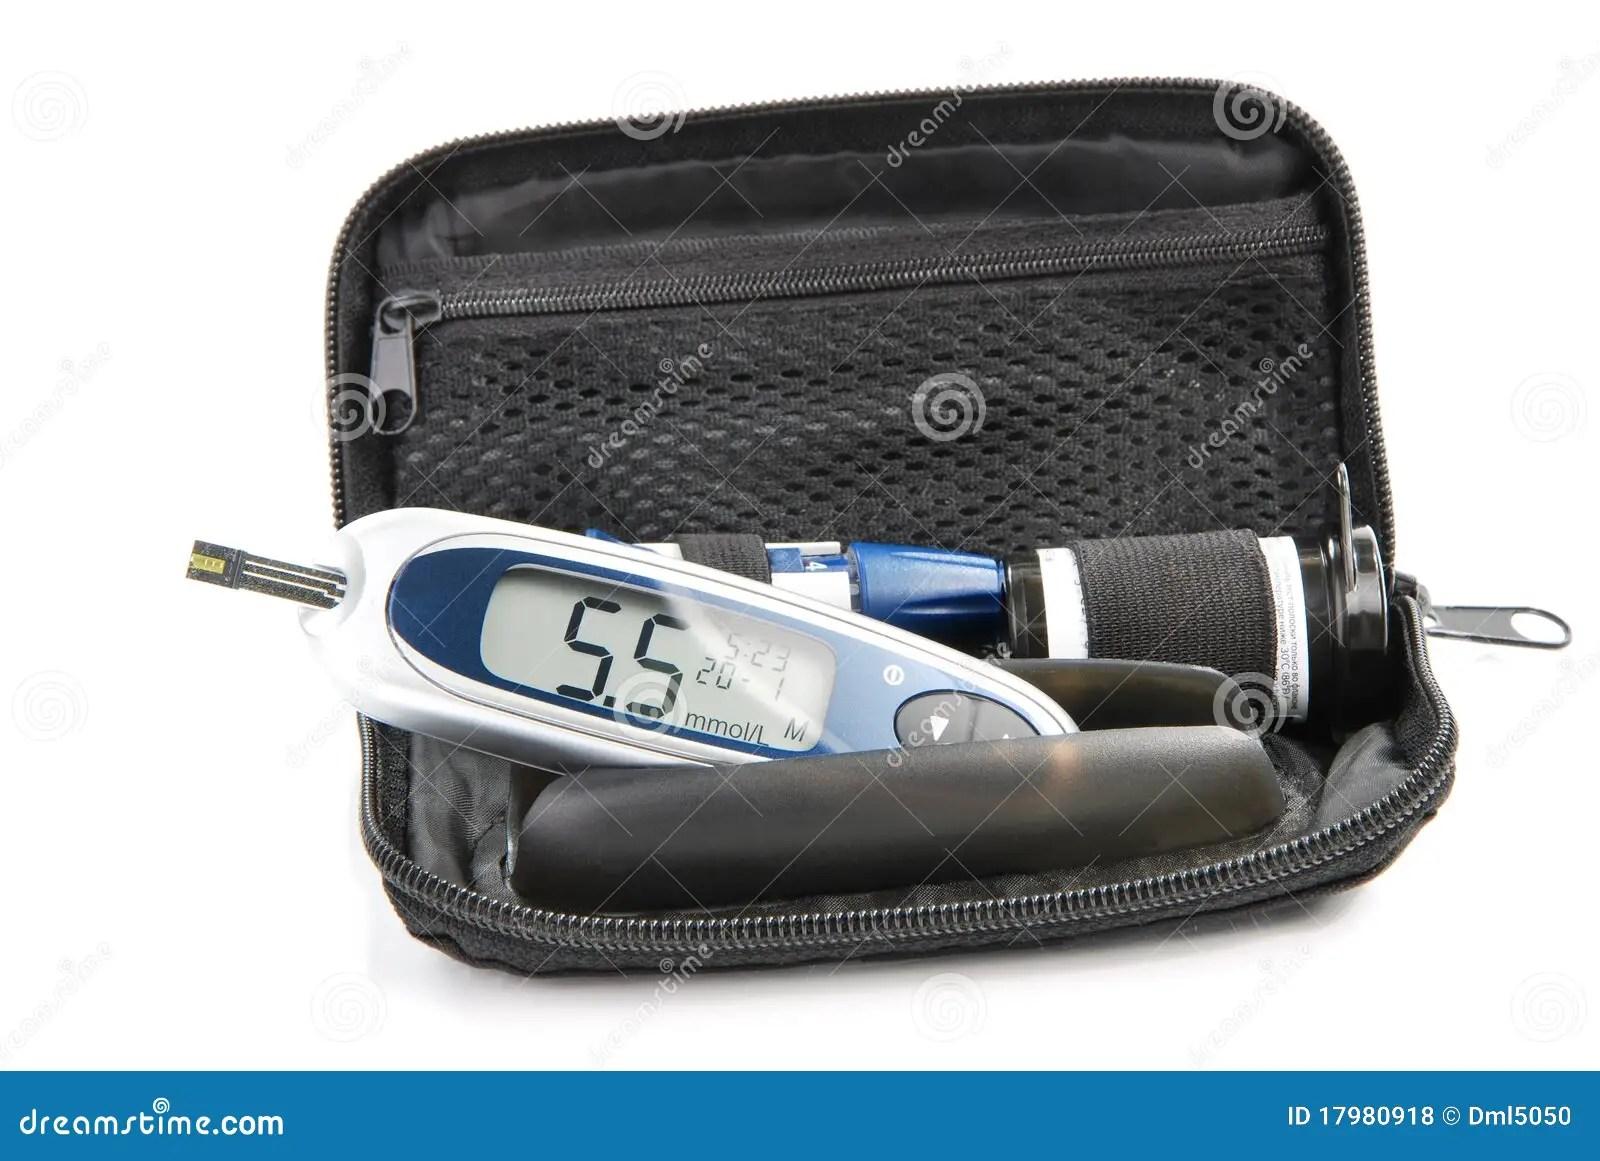 Diabetic Glucometer Blood Sugar Level Testing Kit Stock Photo